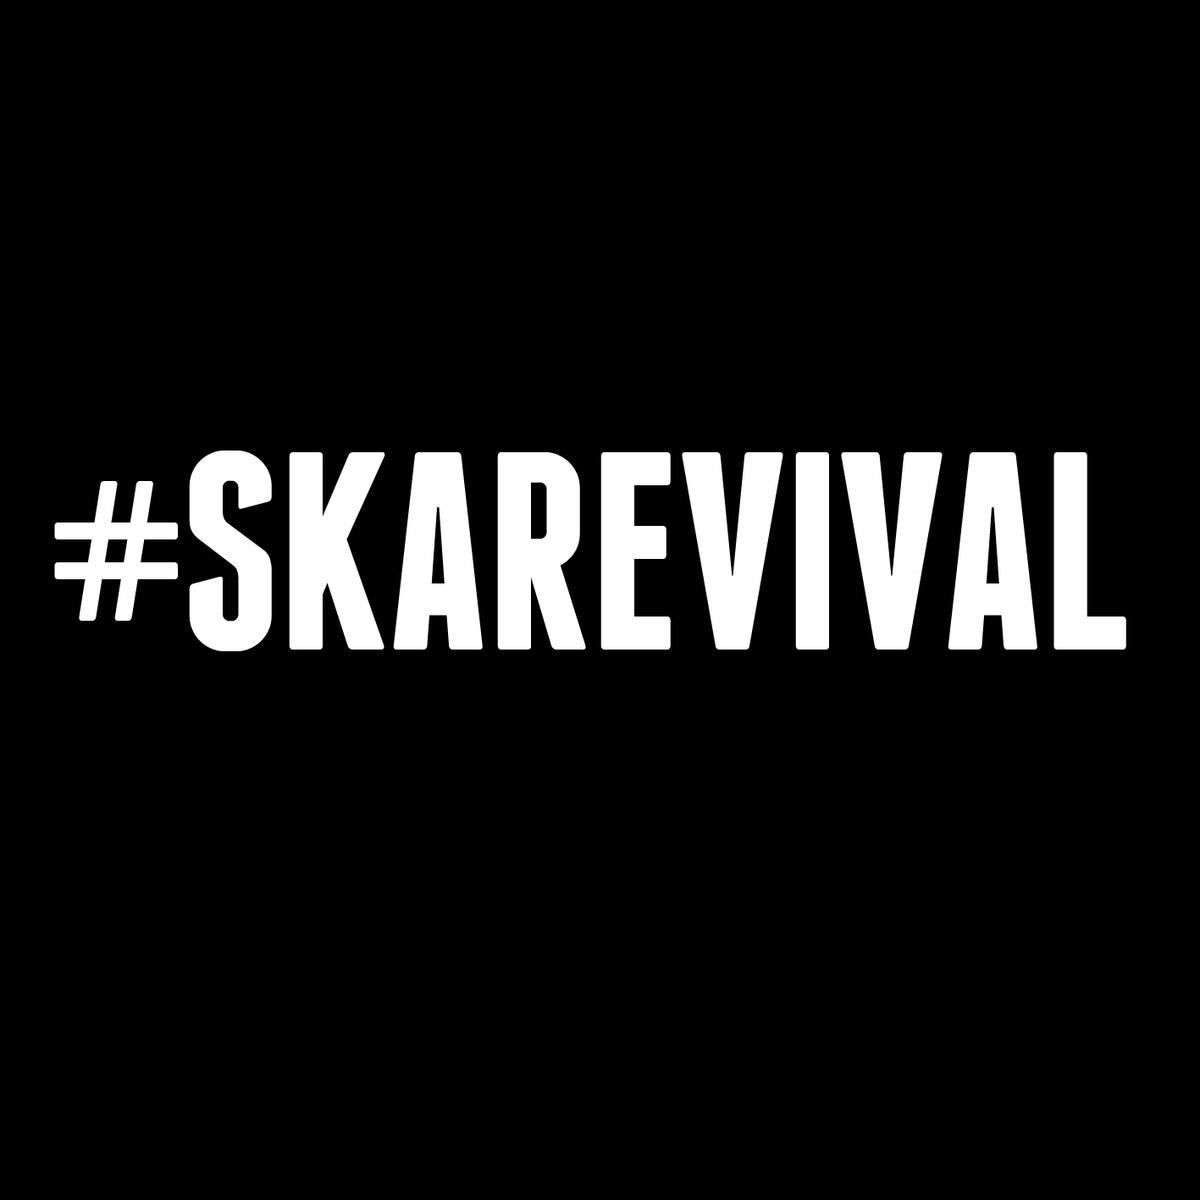 #SkaRevival | Ska Revival Tour